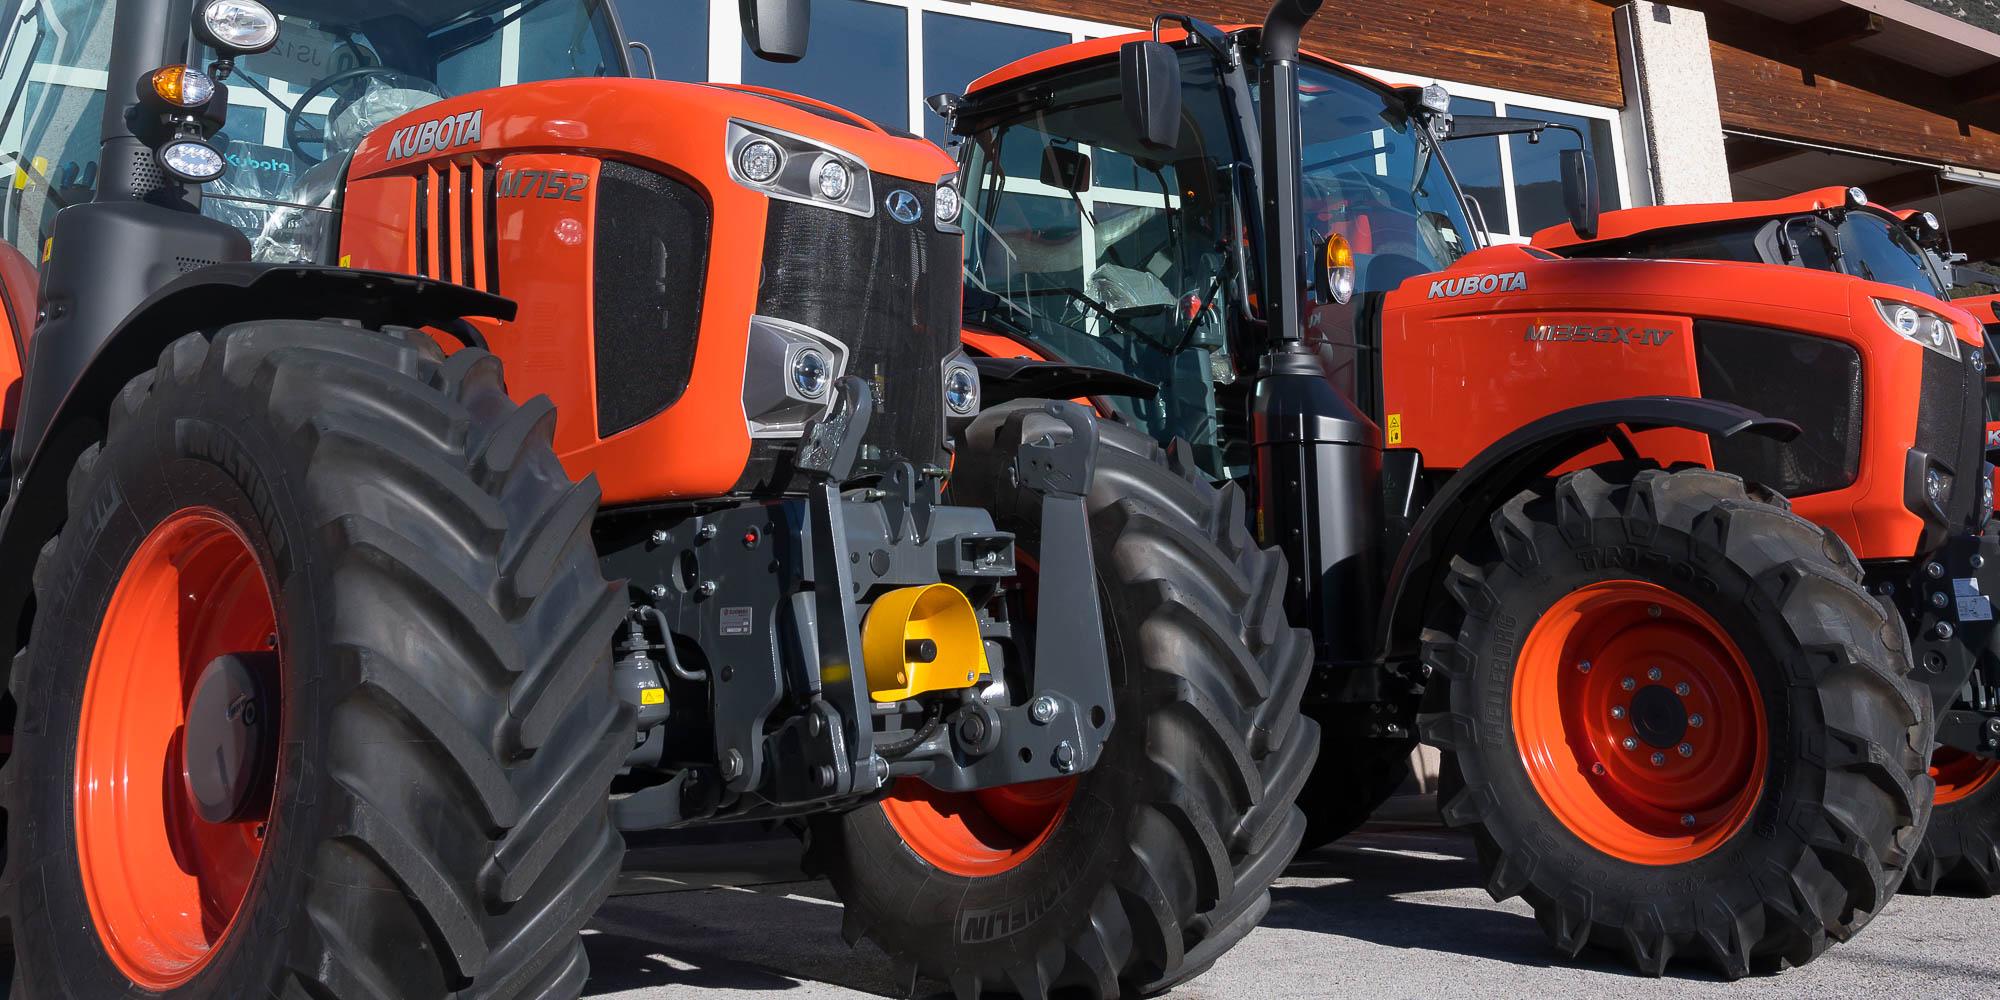 Macchine Agricole Pisoni | Vendita diretta di macchine ...